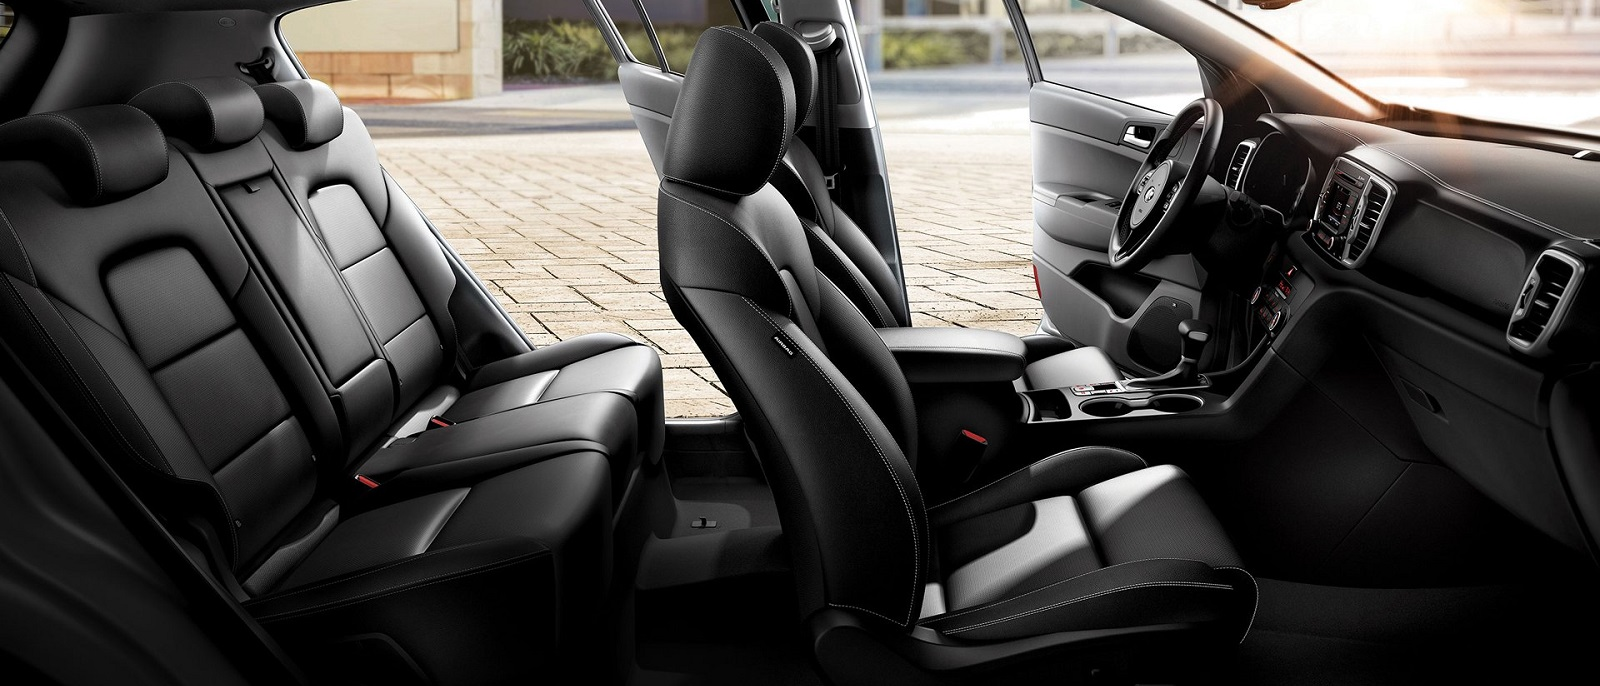 2017 Kia Sportage Seats